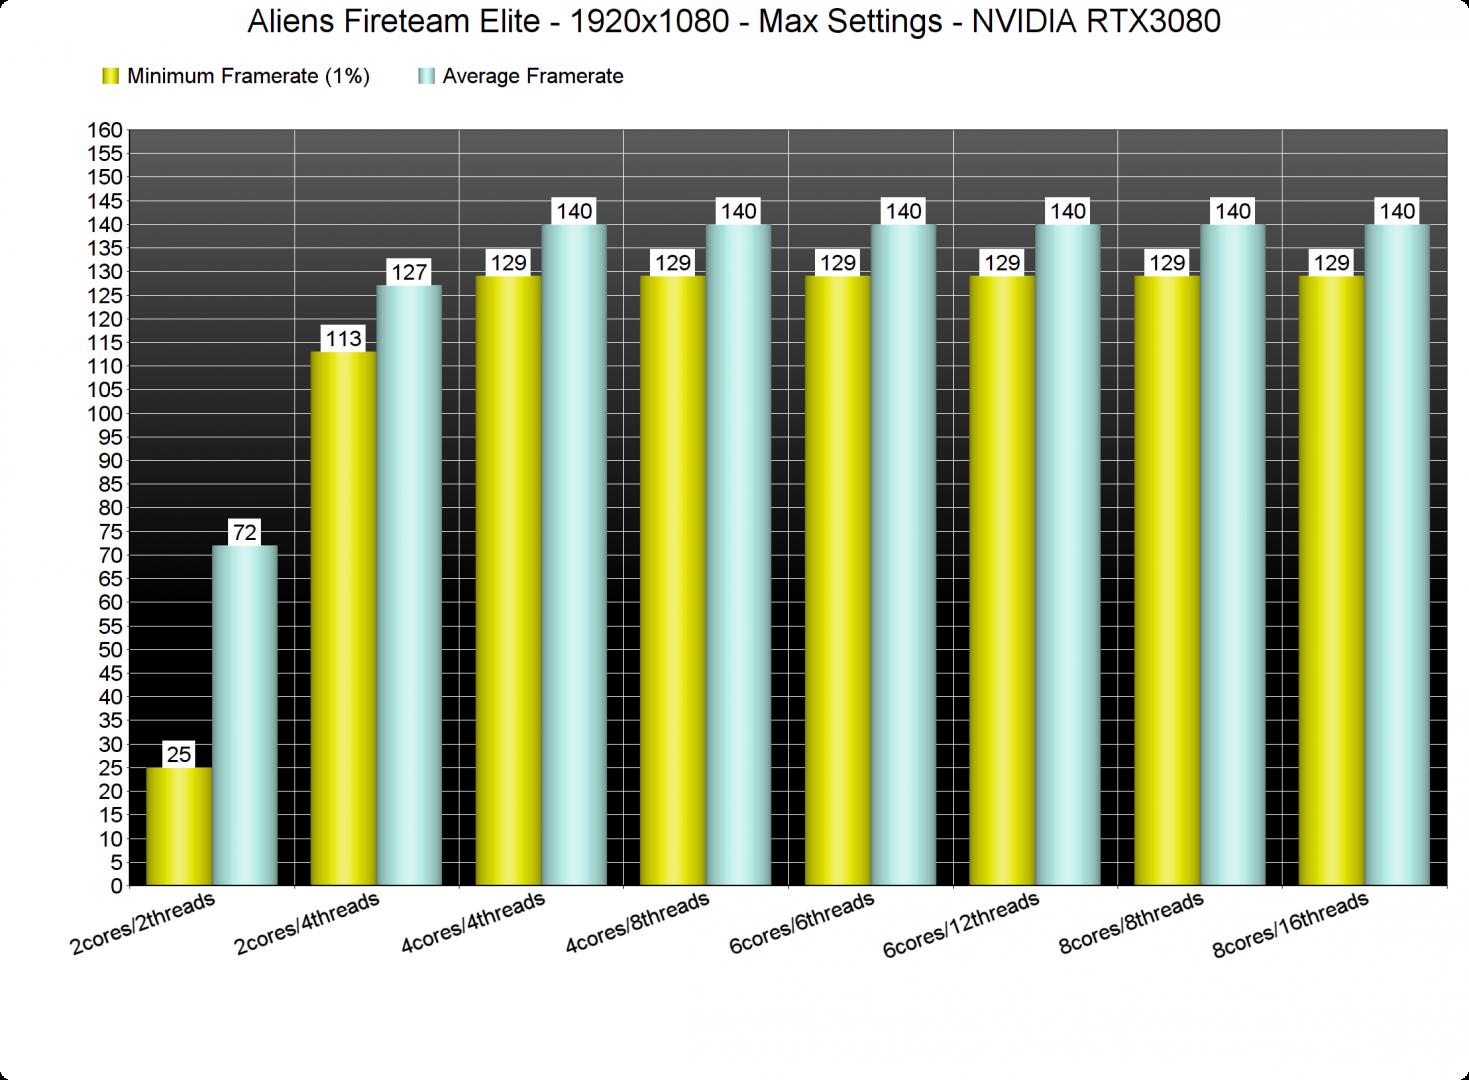 Aliens Fireteam Elite CPU benchmarks